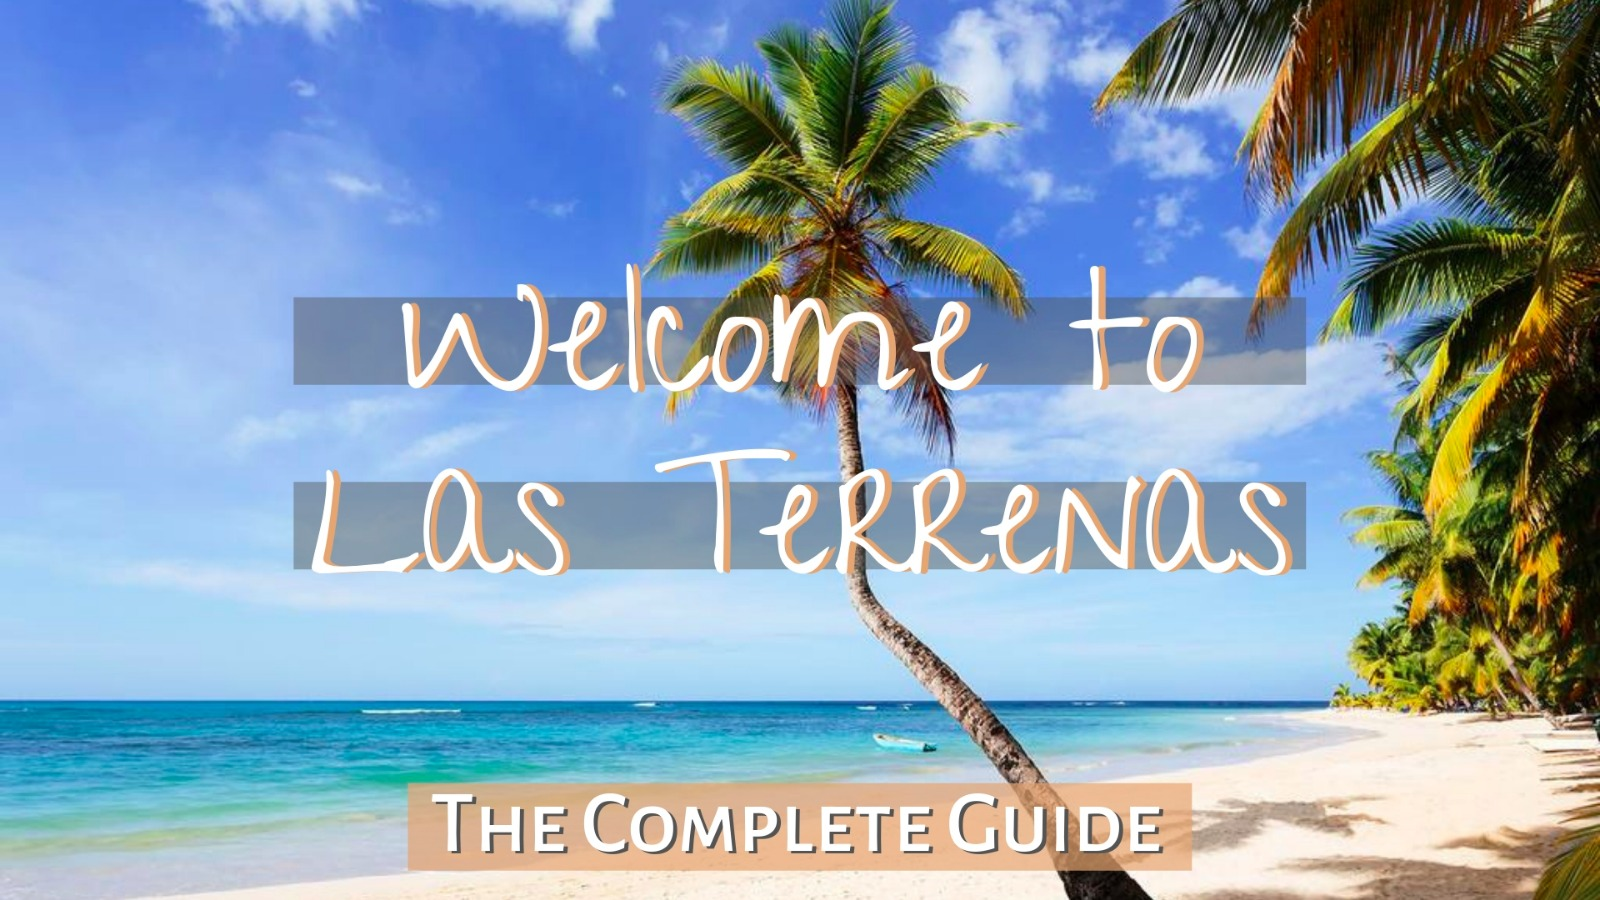 Las Terrenas Complete Guide.jpeg